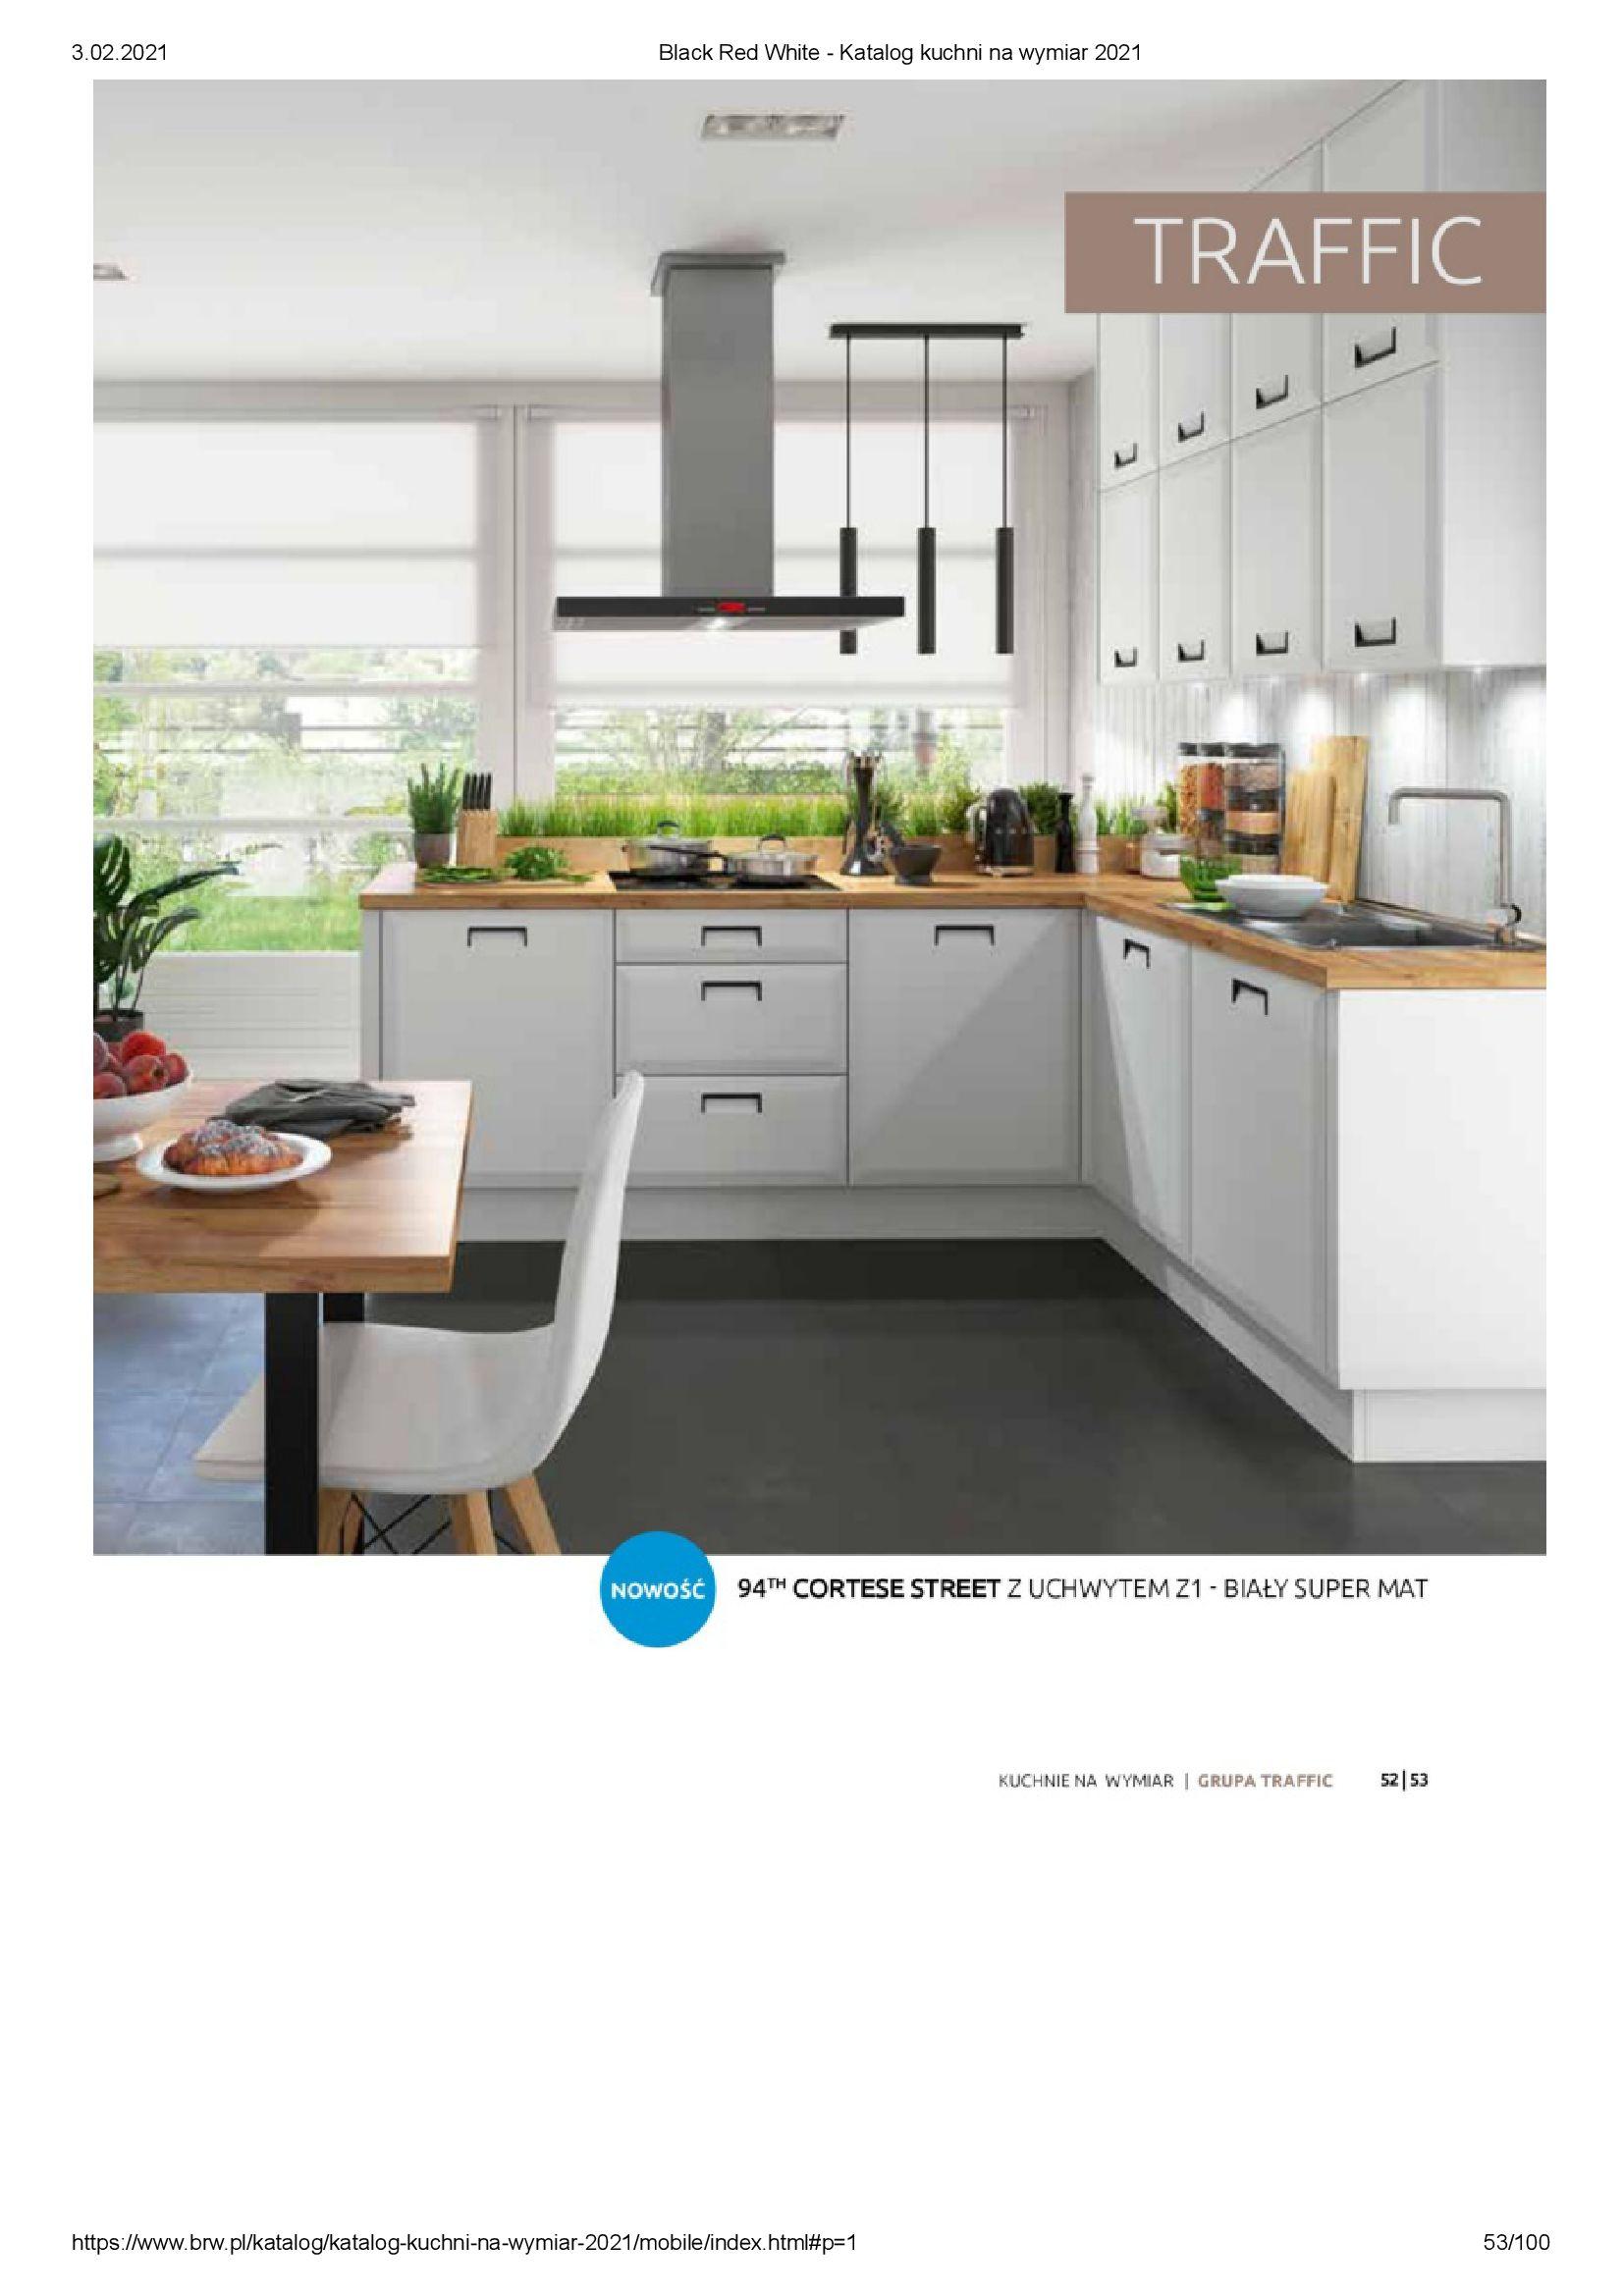 Gazetka Black Red White: Katalog - Kuchnie na wymiar Senso Kitchens 2021 2021-01-01 page-53